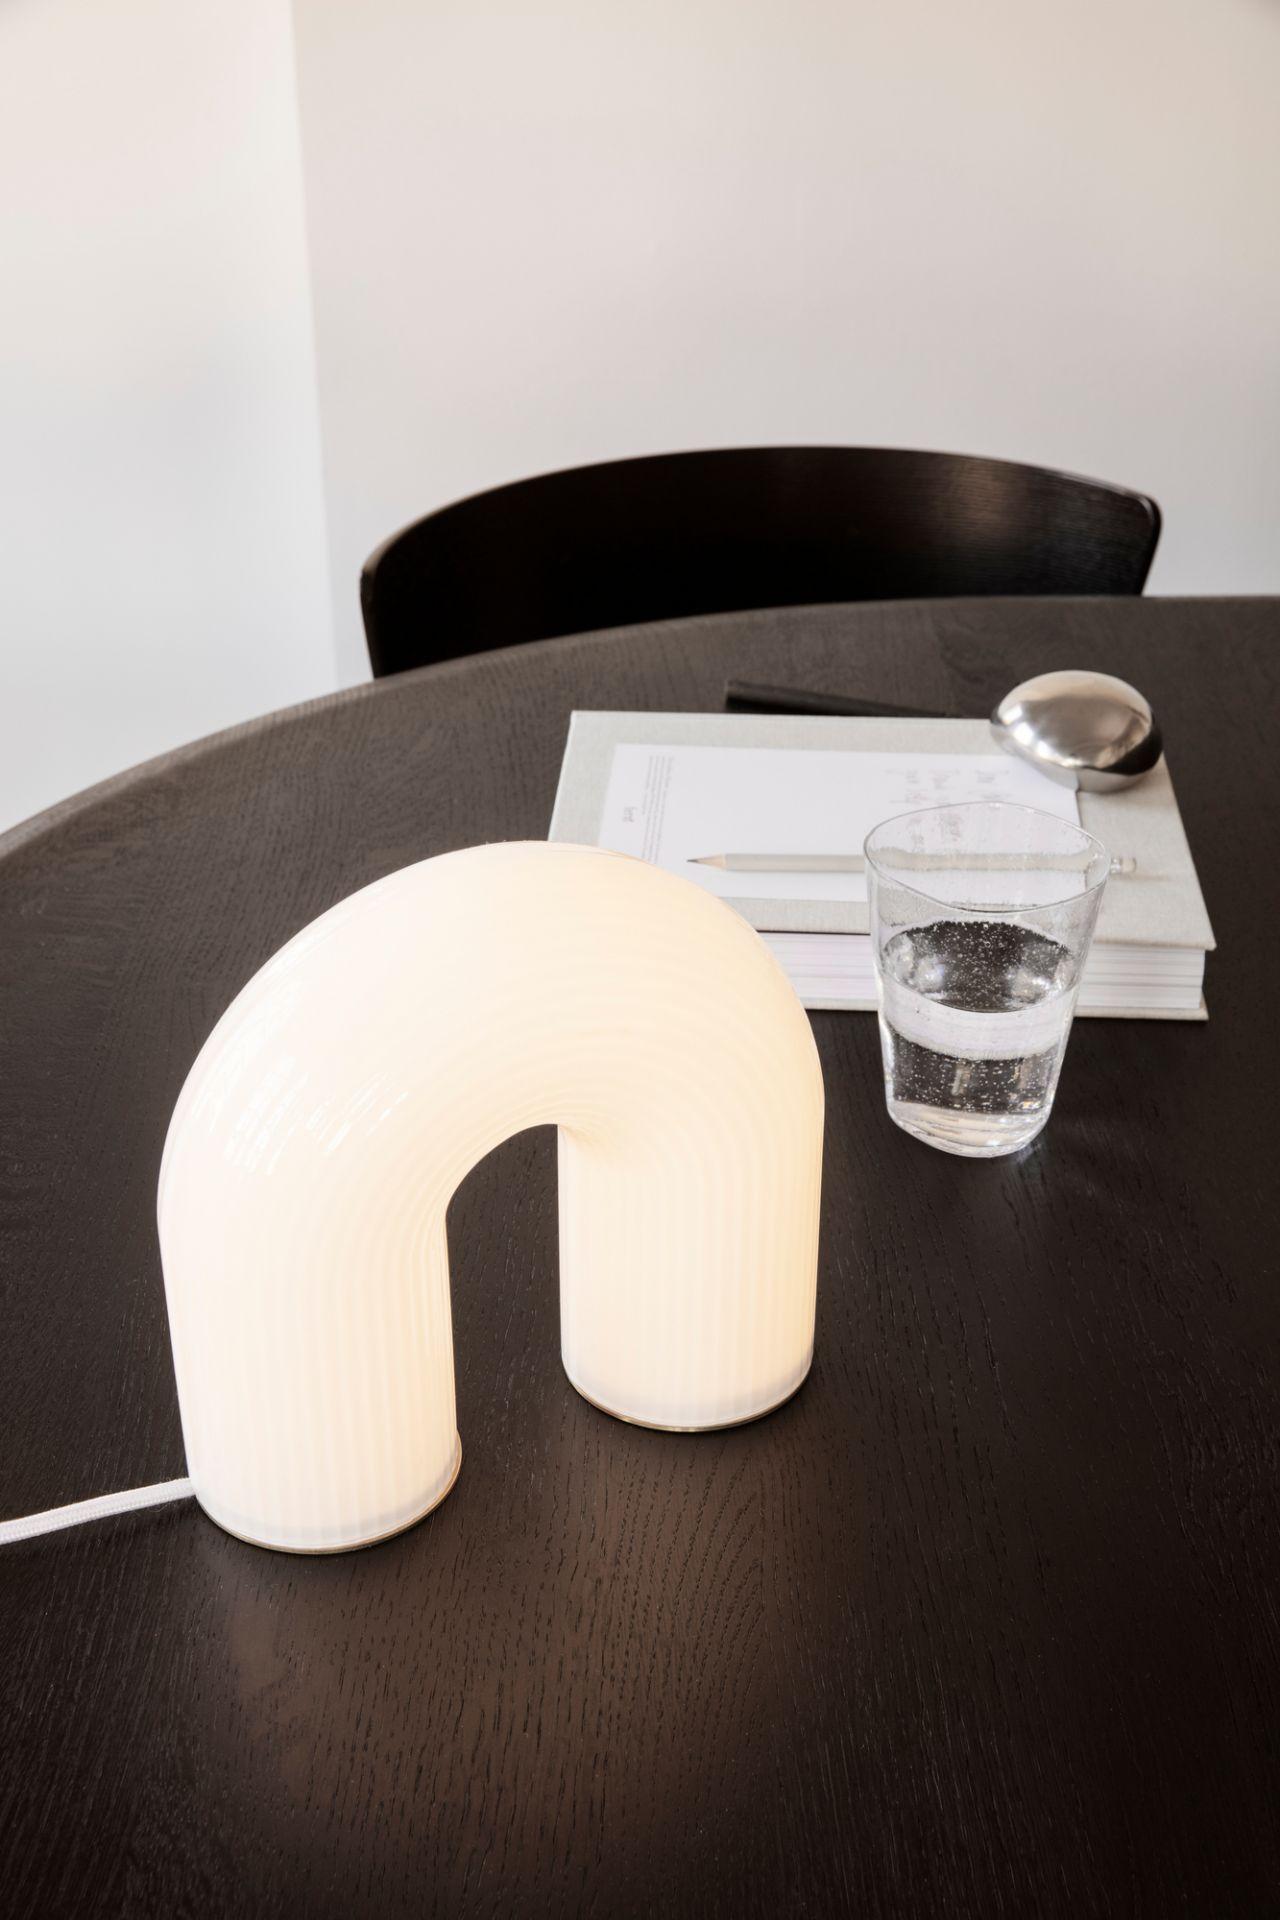 Vuelta lampe de table Ferm Living